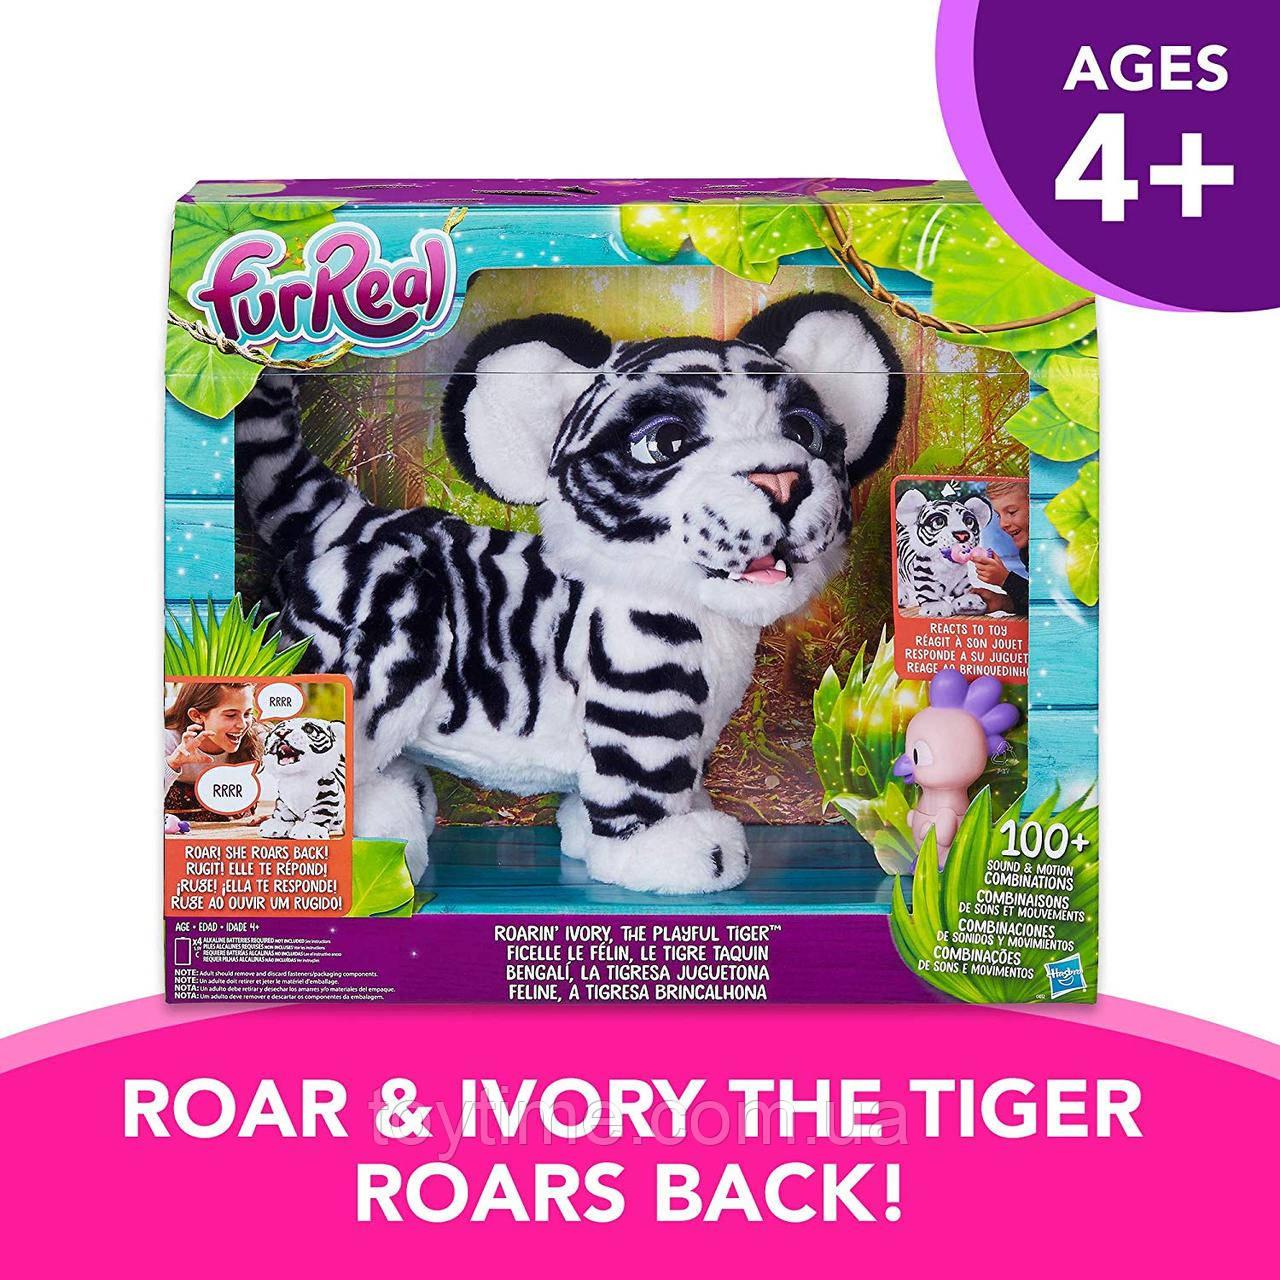 Рычащий Тигренок Айвори FurReal Friends Hasbro / Hasbro FurReal Roarin' Ivory the Playful Tiger